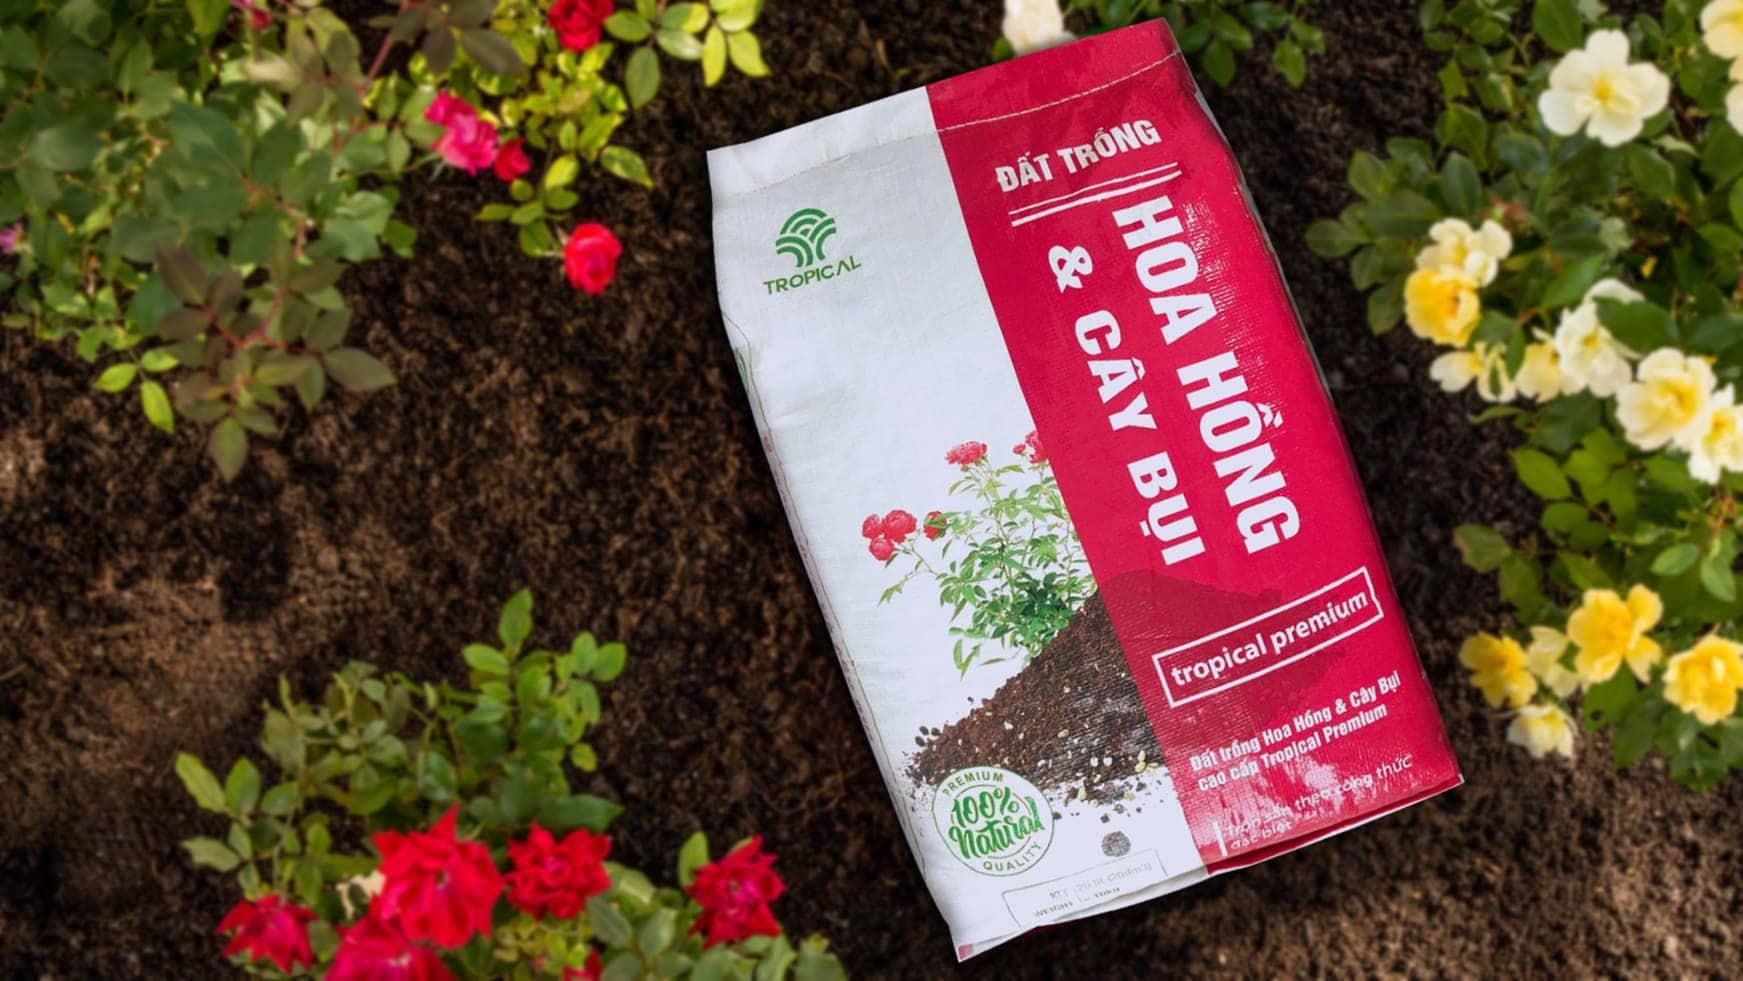 đất trồng hoa hồng Tropical Premium 1